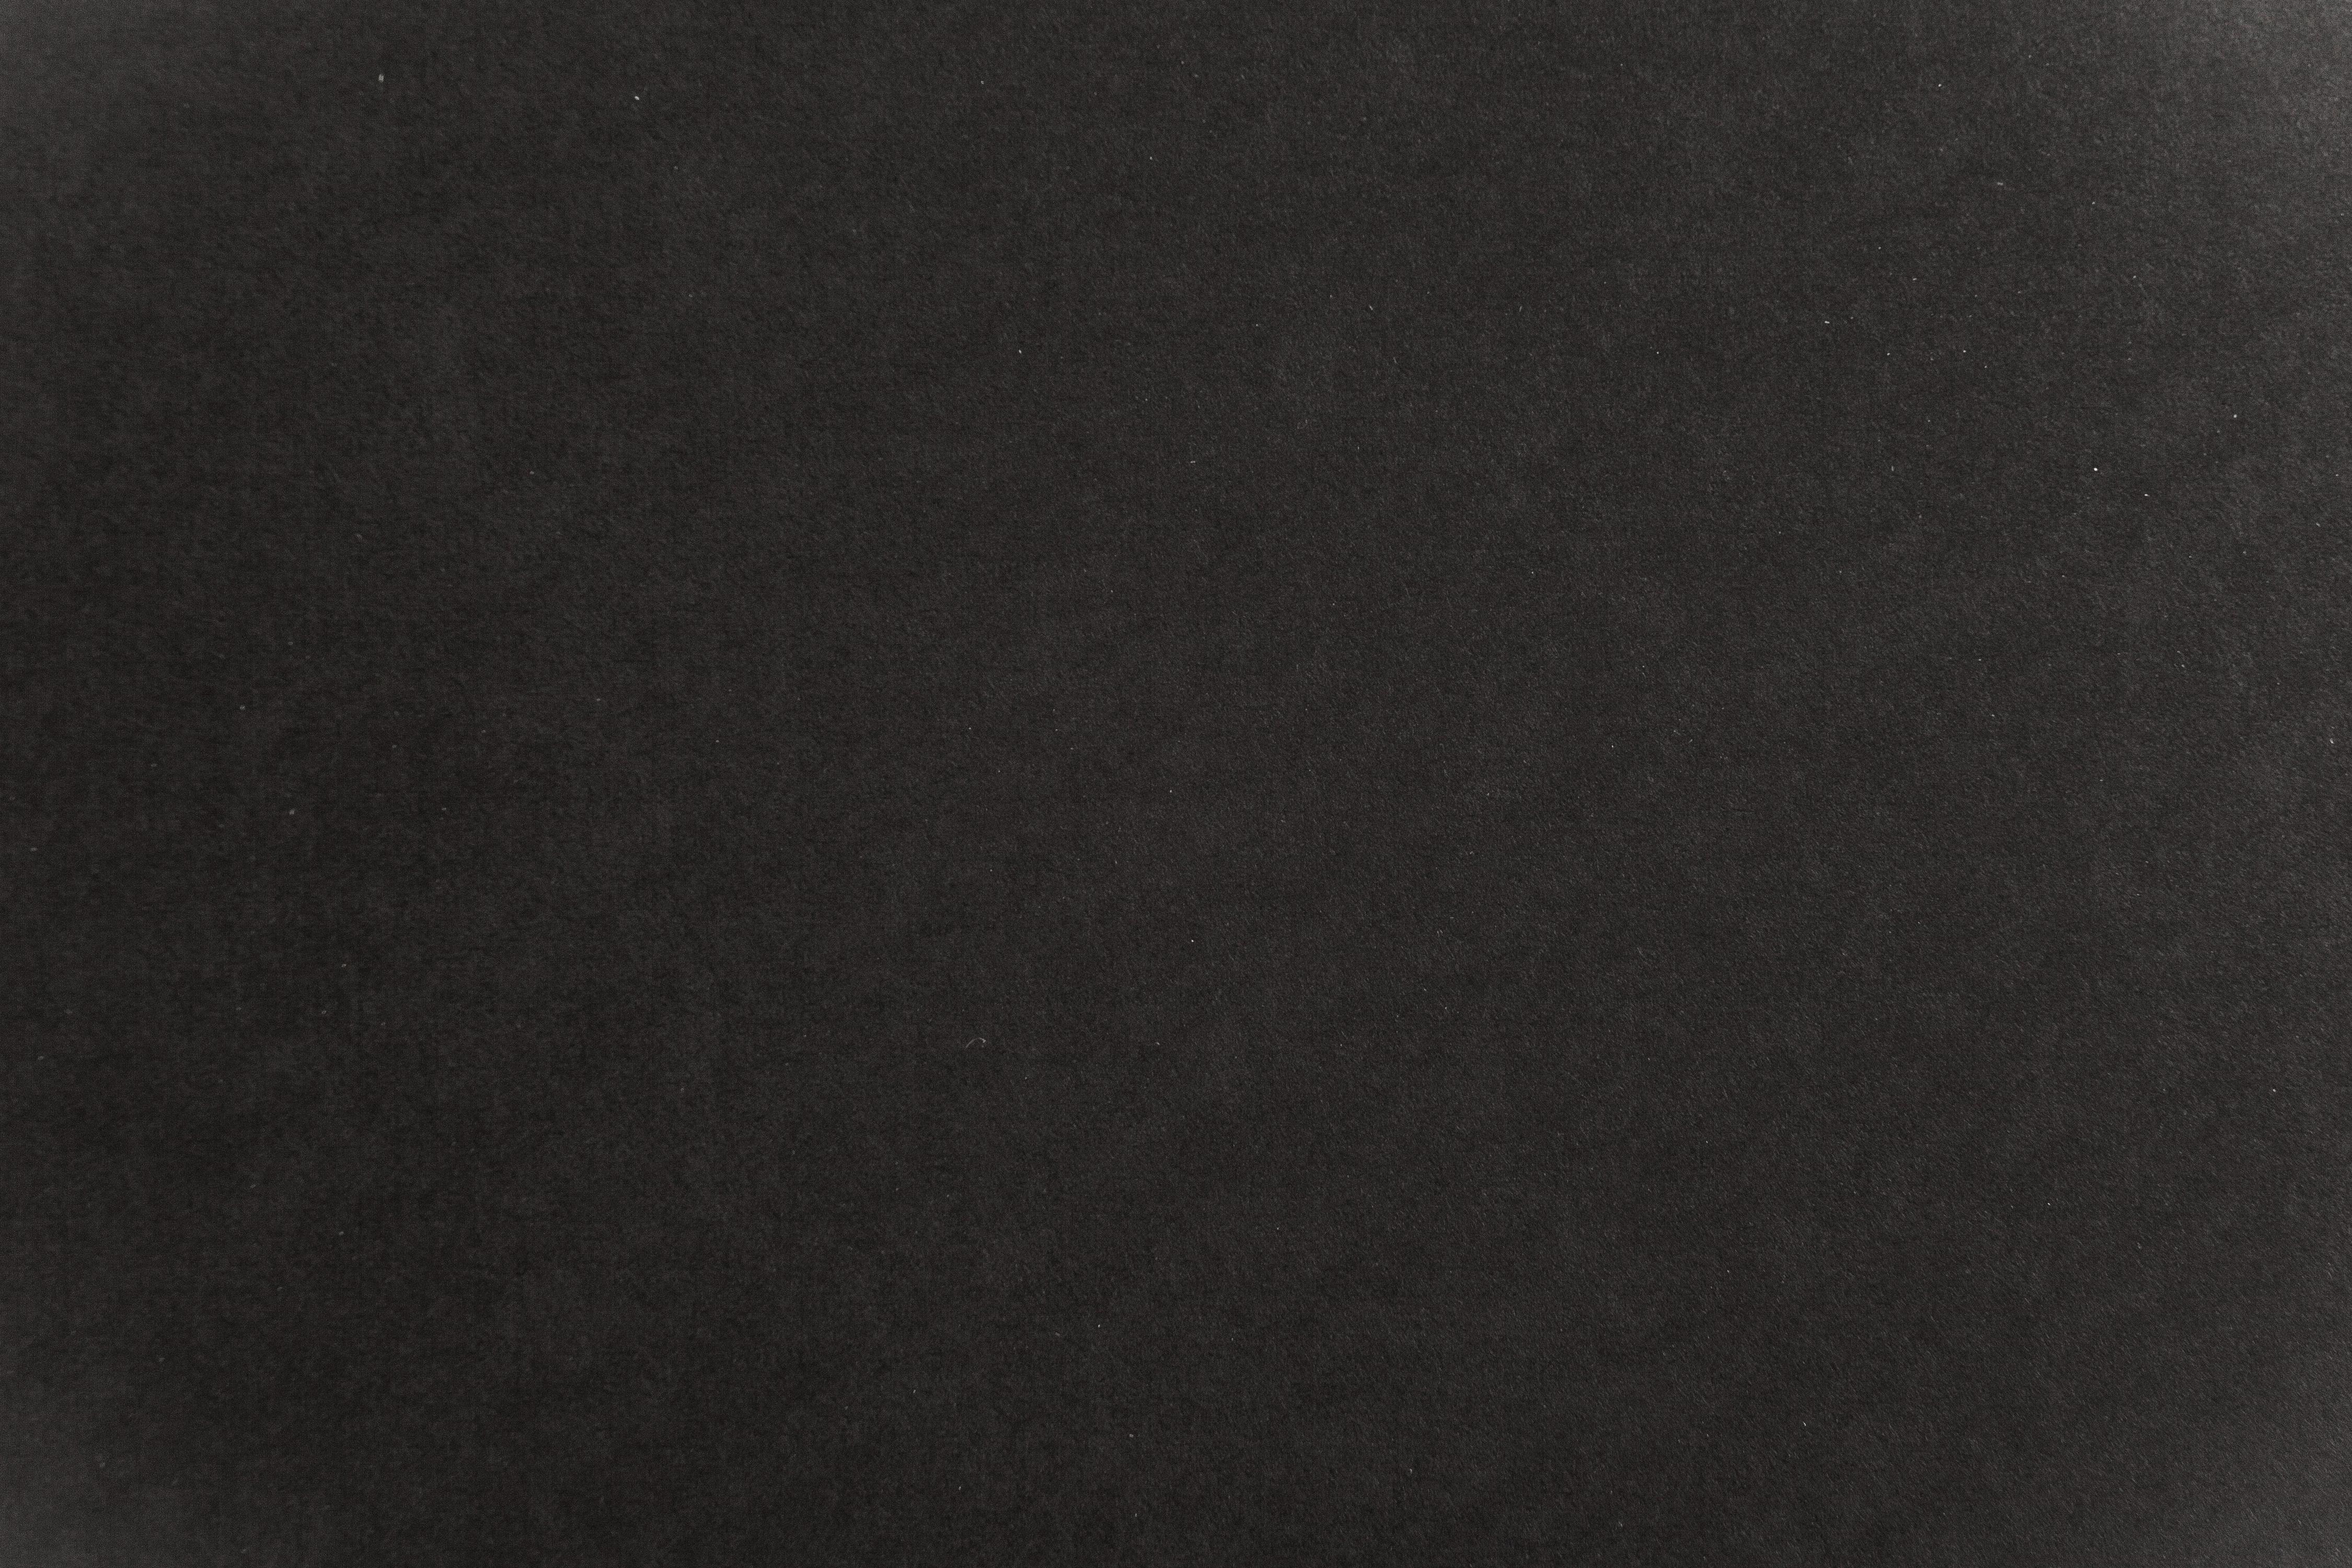 Black Paper Texture, Black, Cardboard, Dark, Paper, HQ Photo